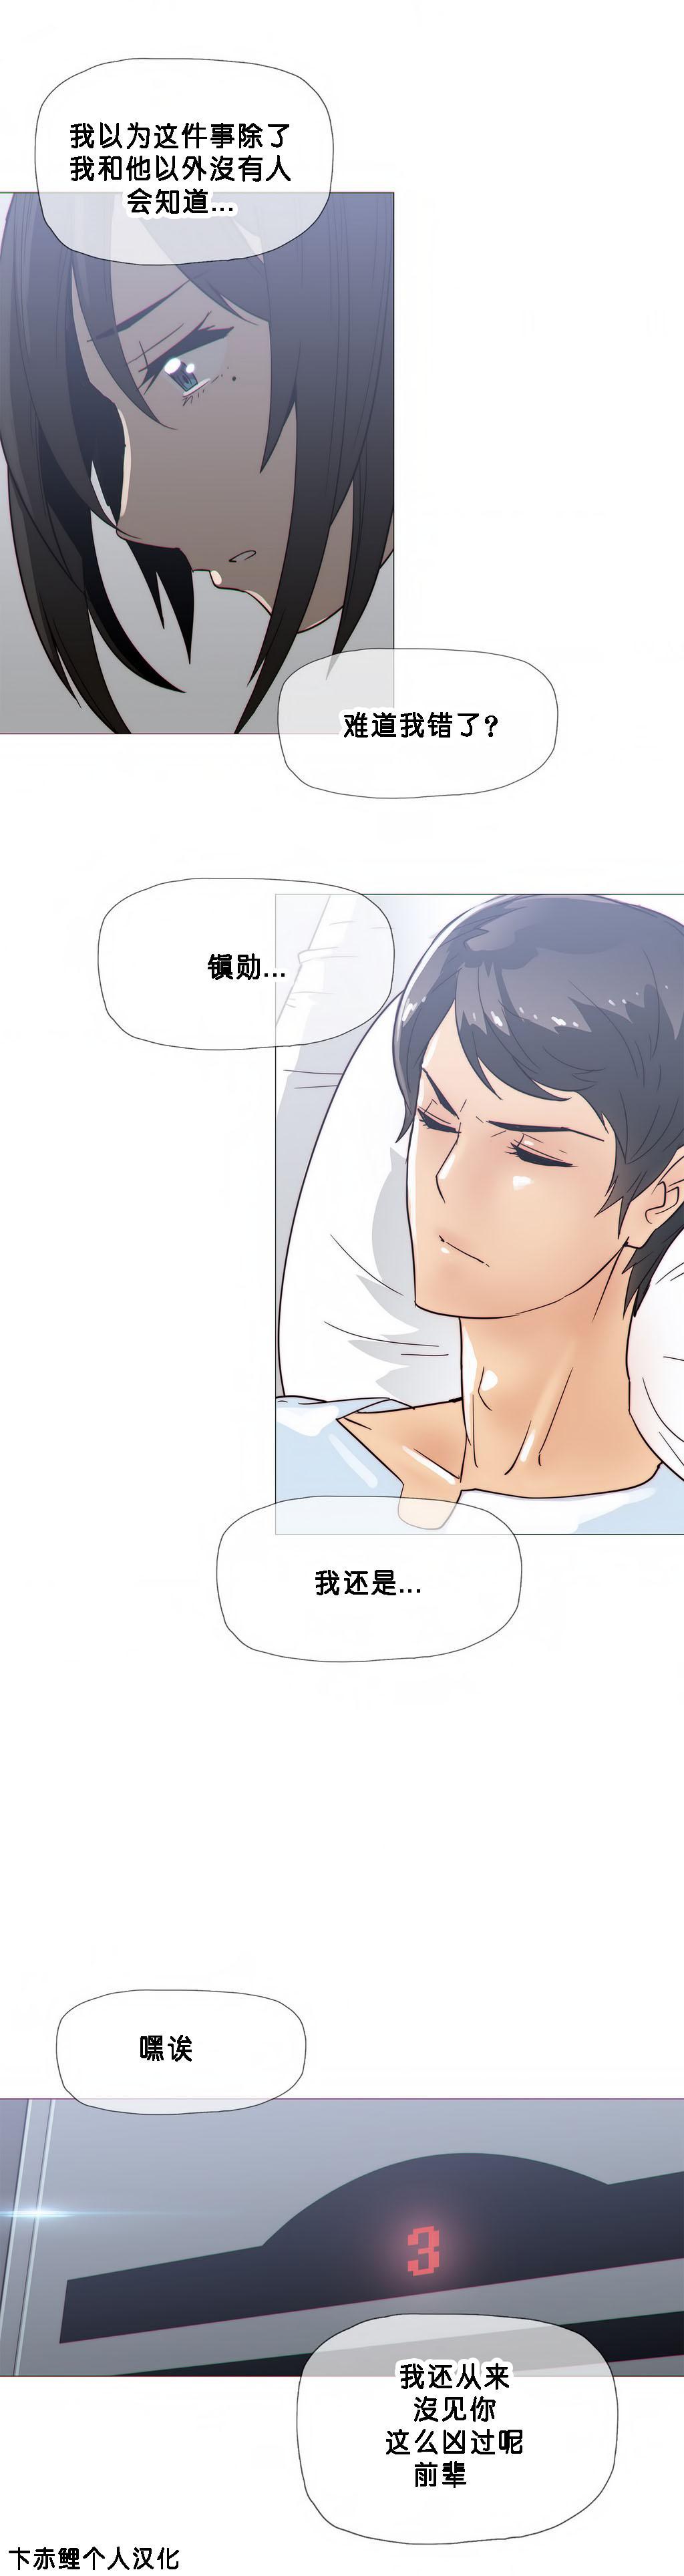 HouseHold Affairs 【卞赤鲤个人汉化】1~33话(持续更新中) 462